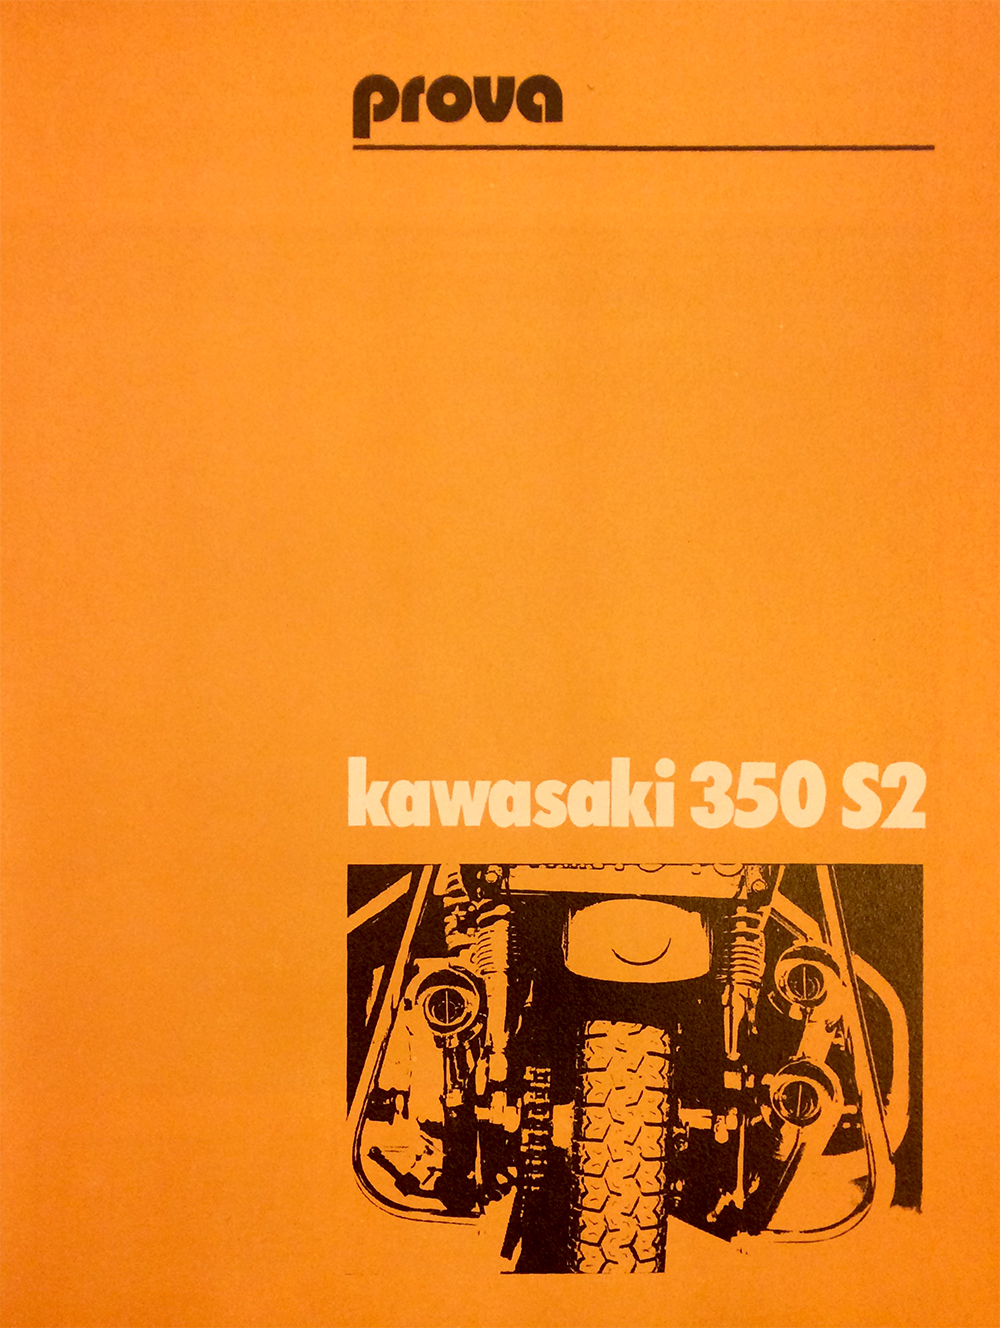 1971 Kawasaki 350 S2 Italy road test 01.jpg